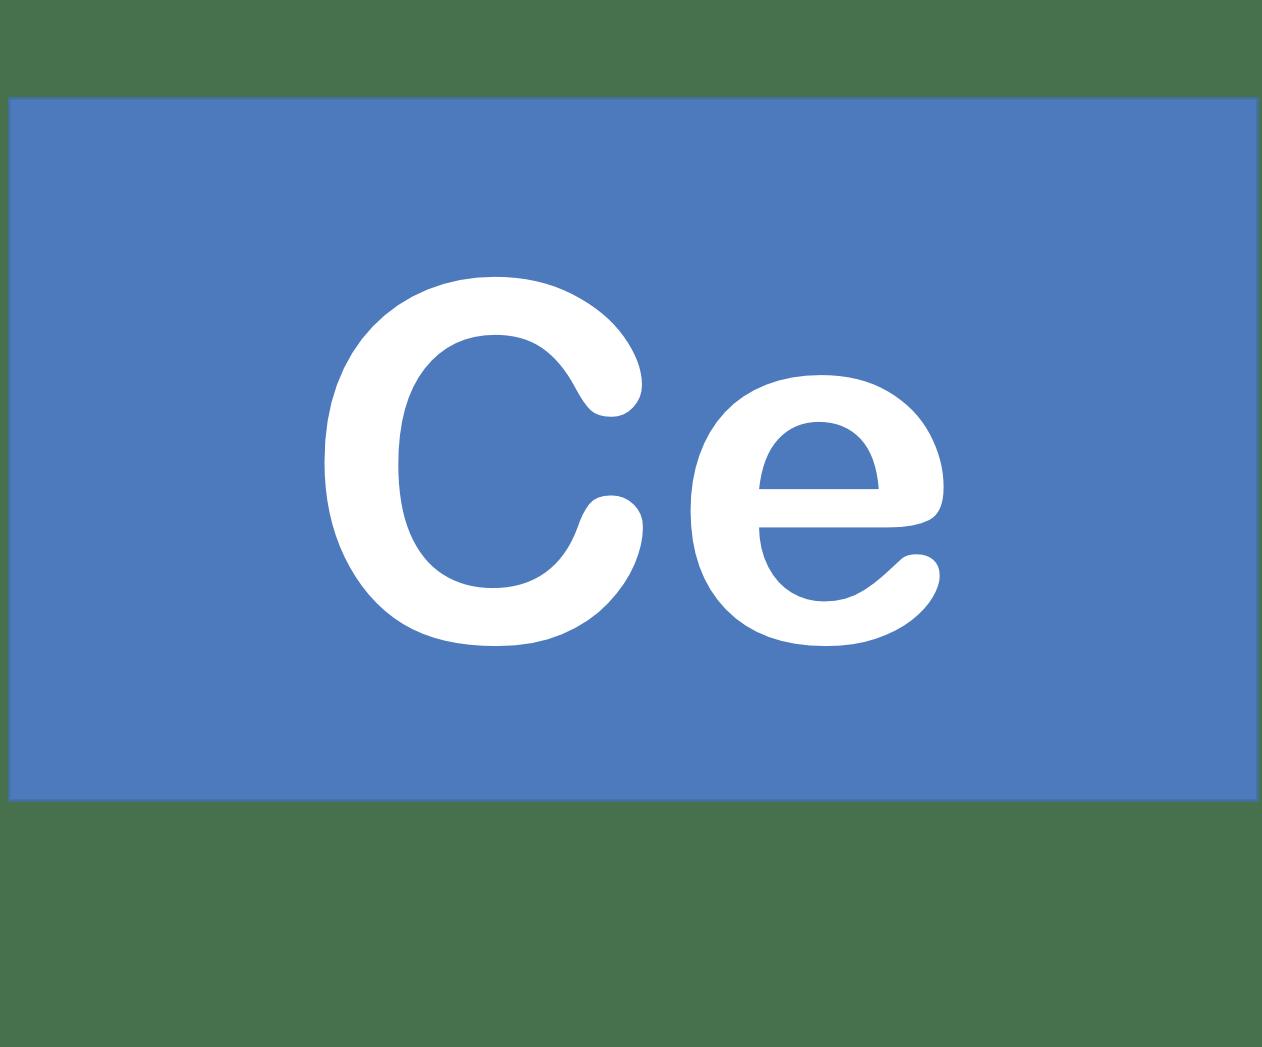 58 Ce セリウム Cerium 元素 記号 周期表 化学 原子